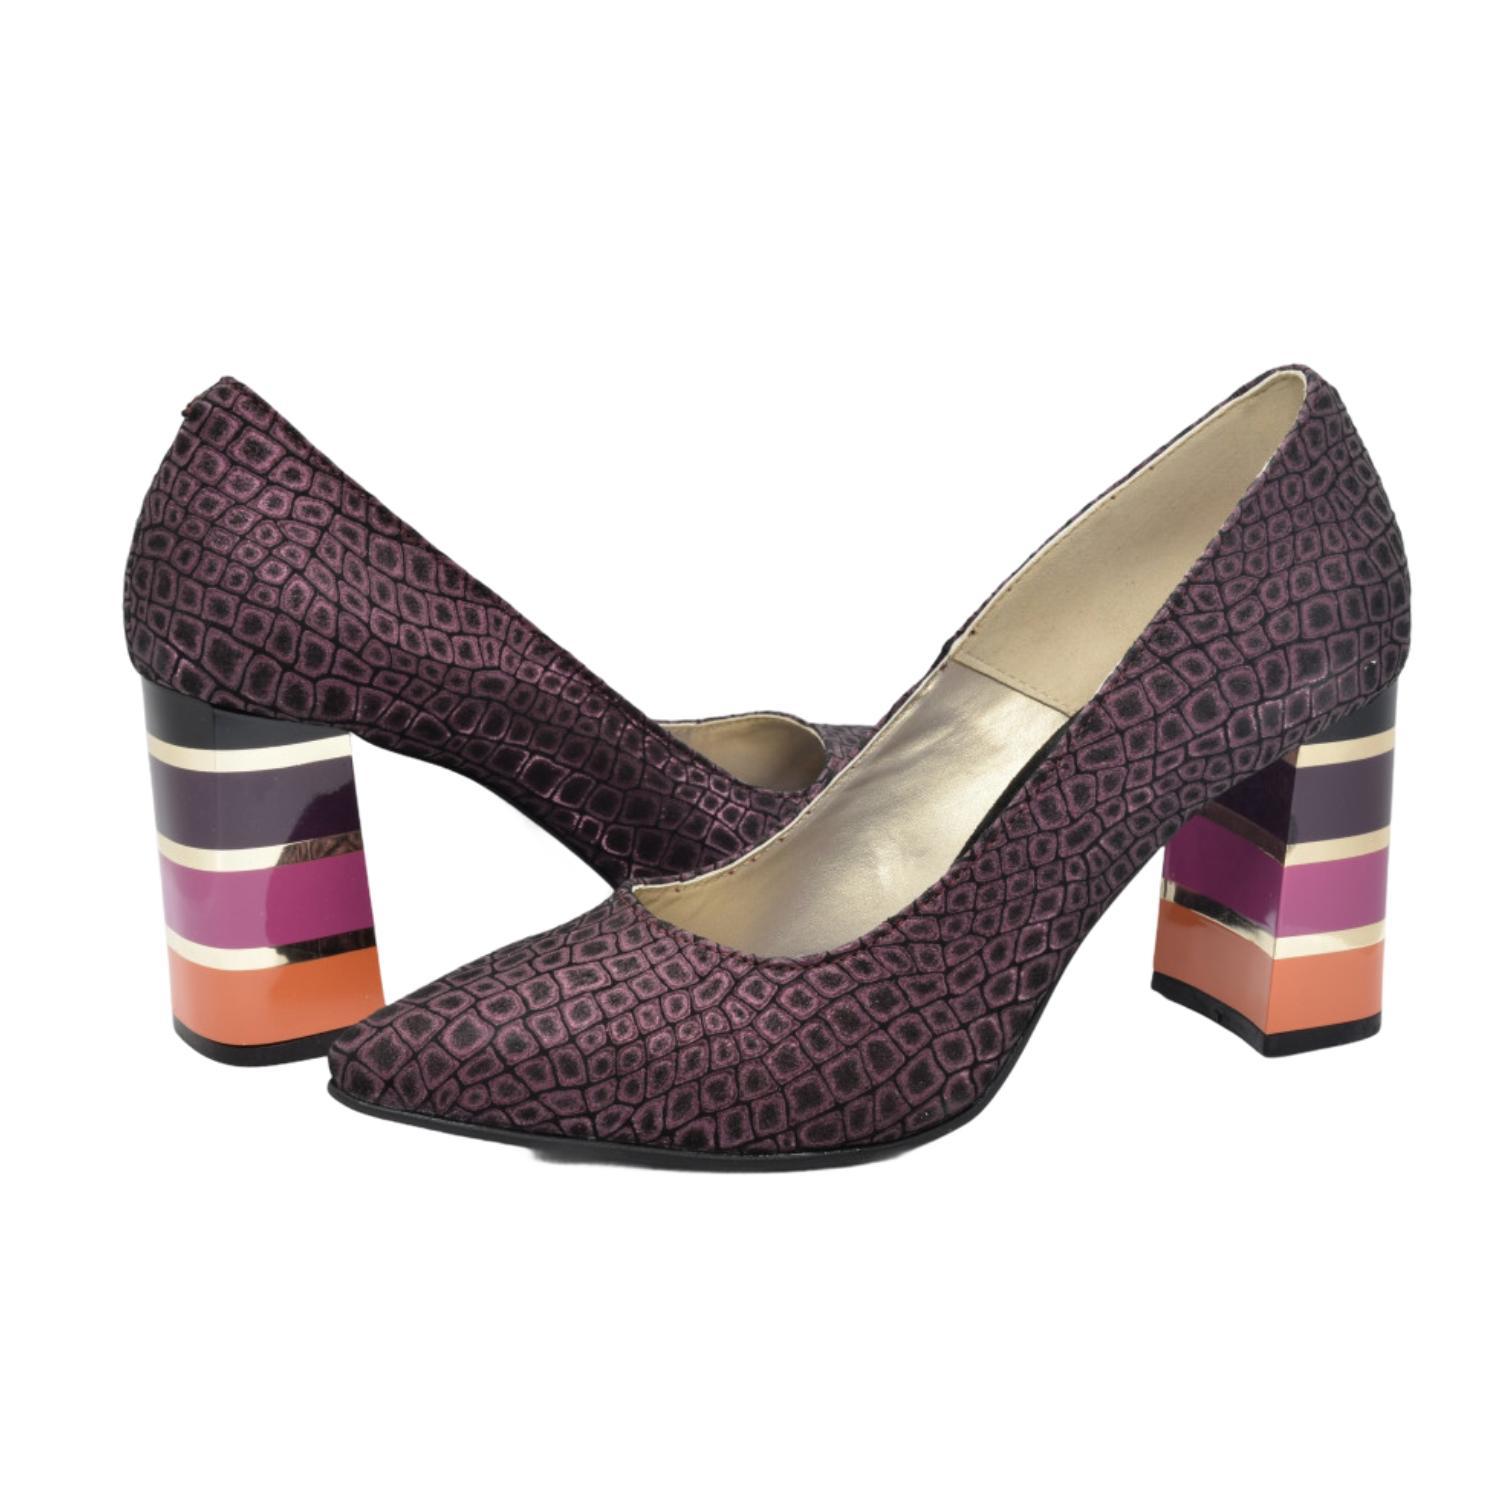 Pantofi mov cu imprimeu abstract si toc in dungi